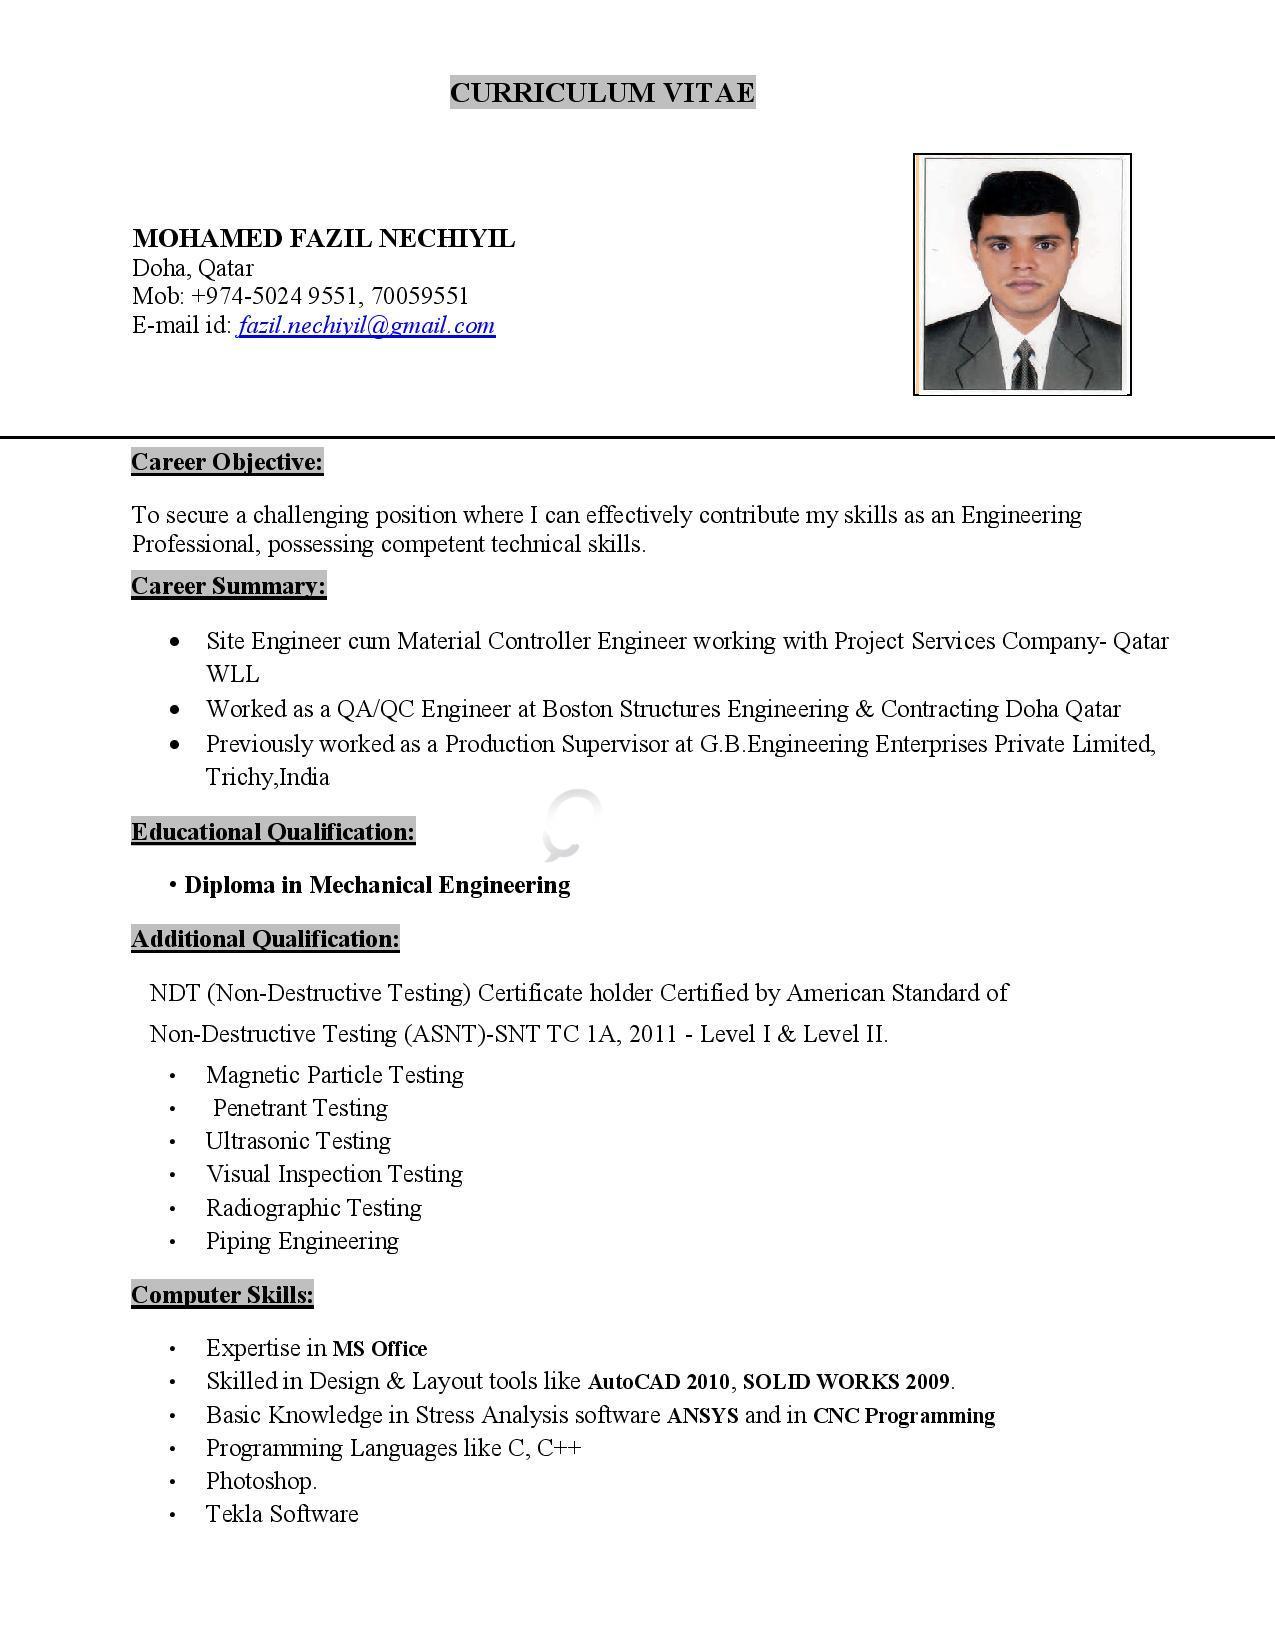 MECHANICAL SITE ENGINEER / QA/QC ENGINEER | Qatar Living